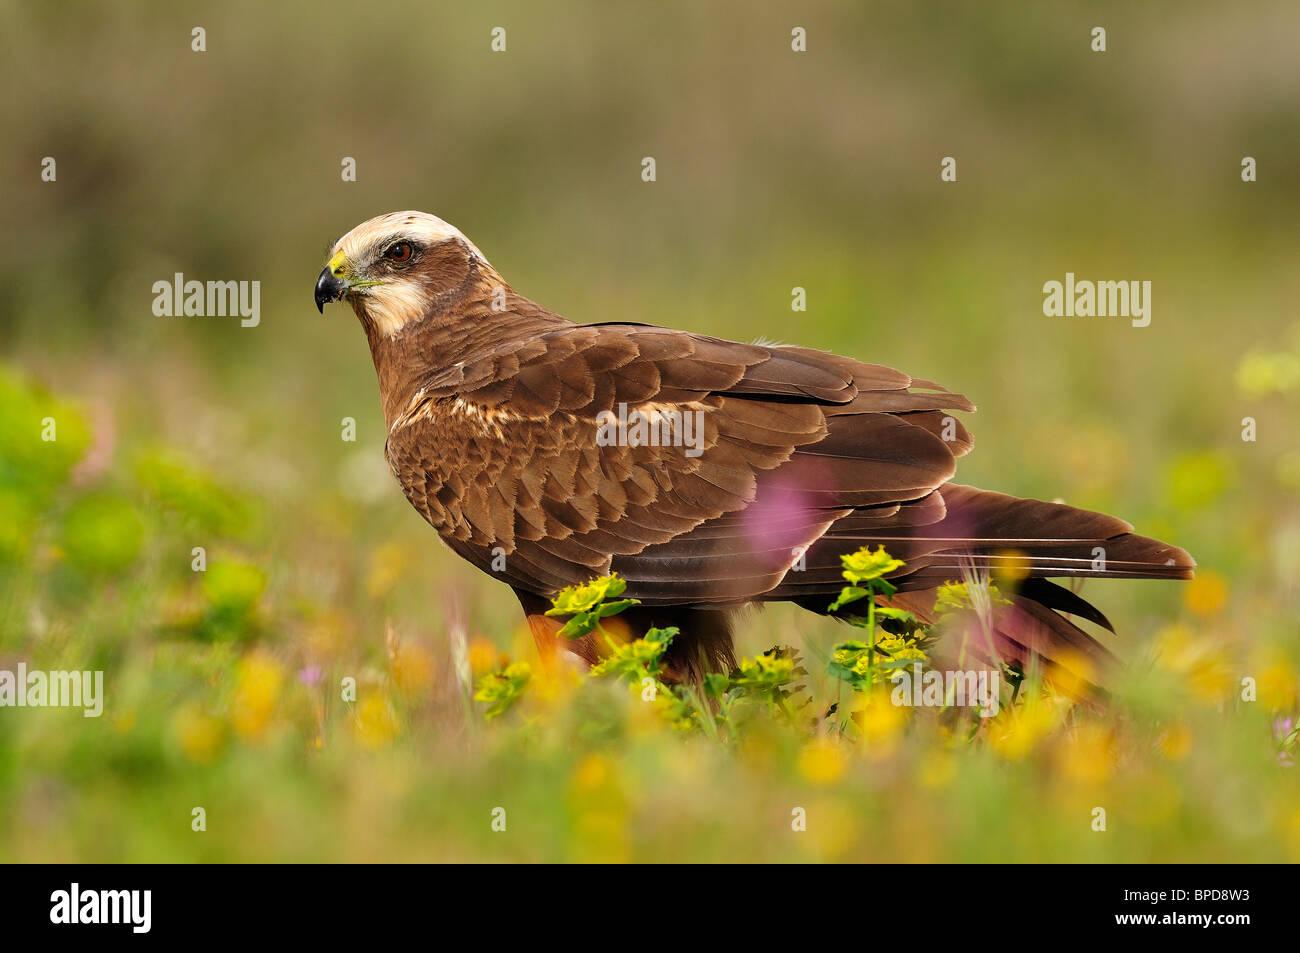 Western Marsh Harrier between the vegetation of the field in spring. Stock Photo